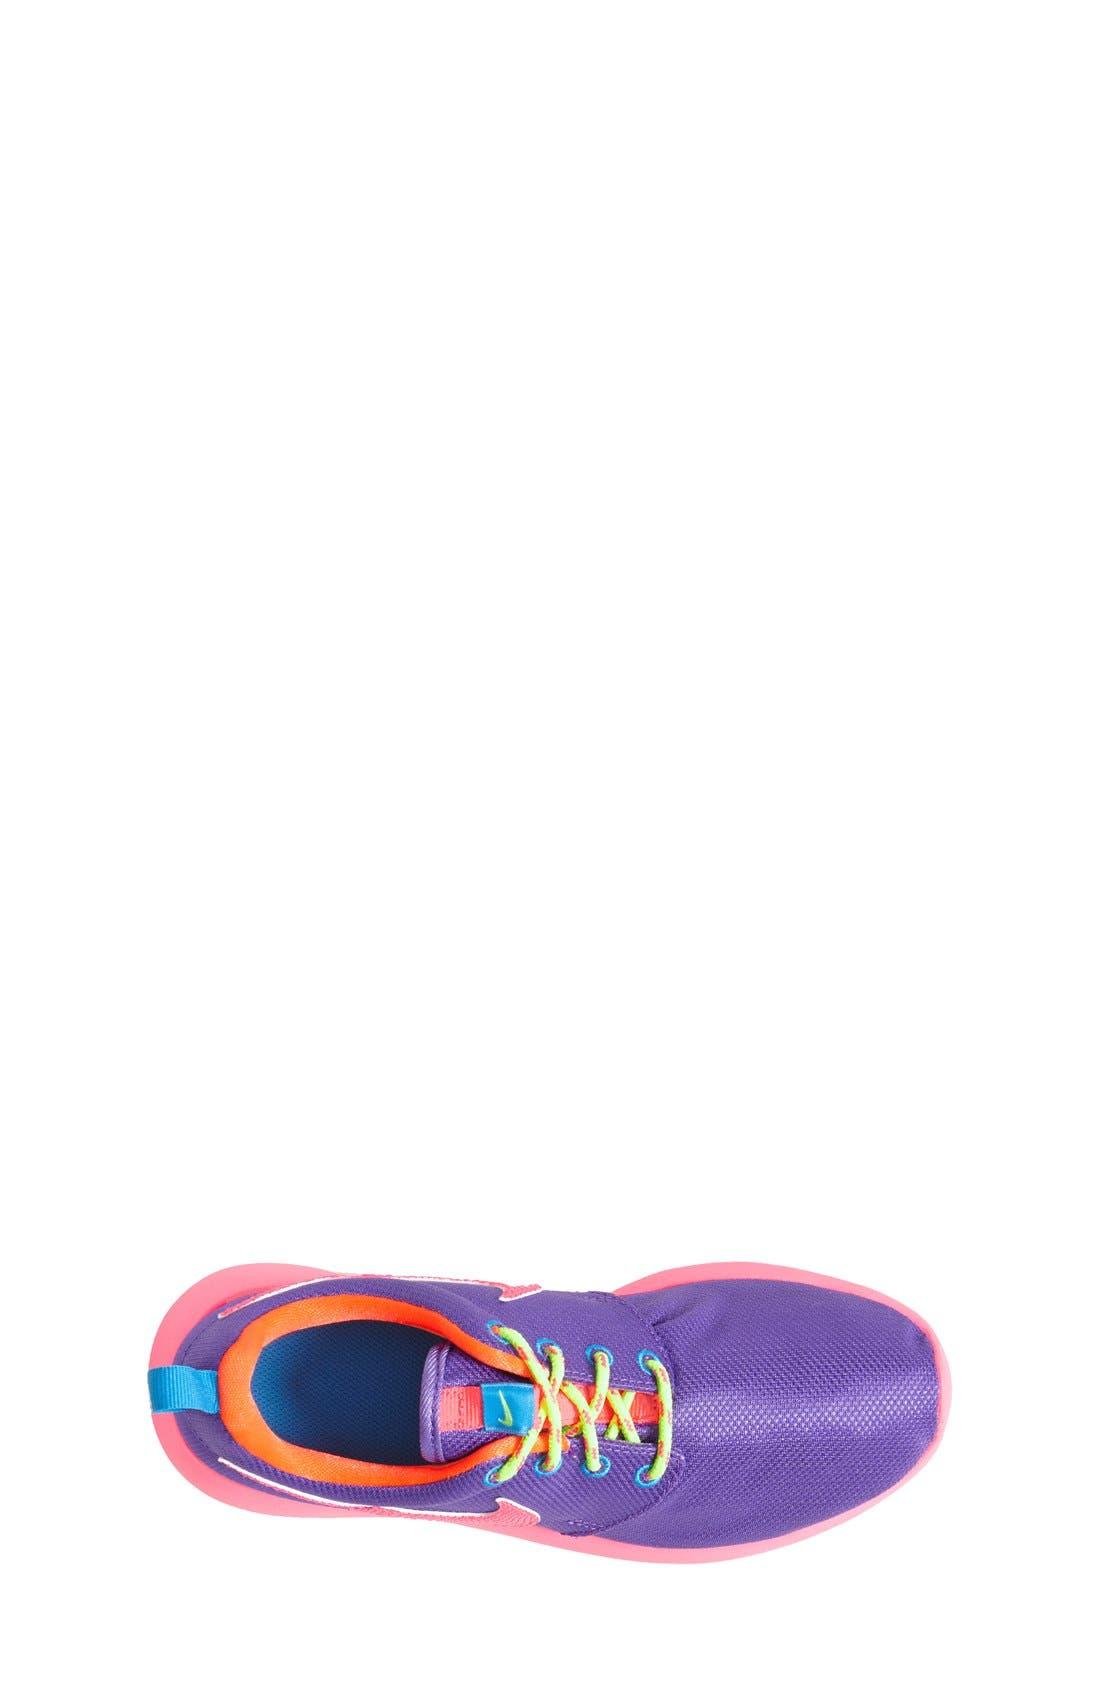 'Roshe Run' Athletic Shoe,                             Alternate thumbnail 97, color,